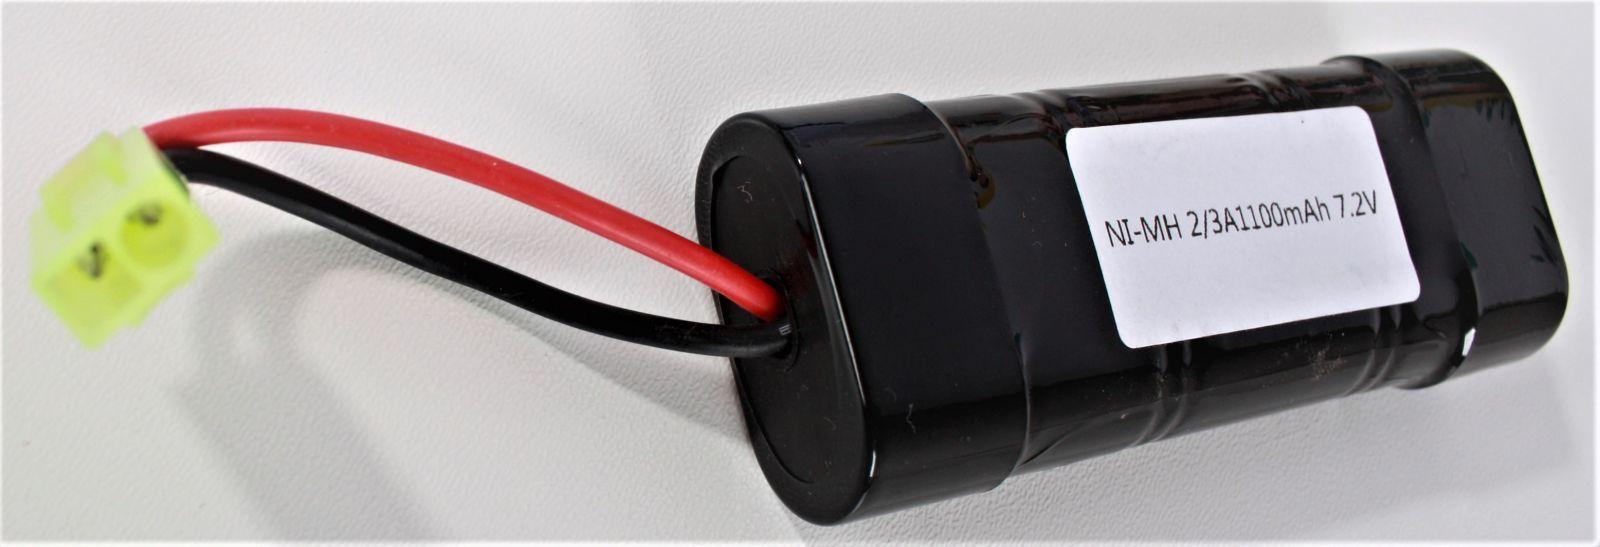 Baterie NI-MH 2/3A1100mAh 7,2V